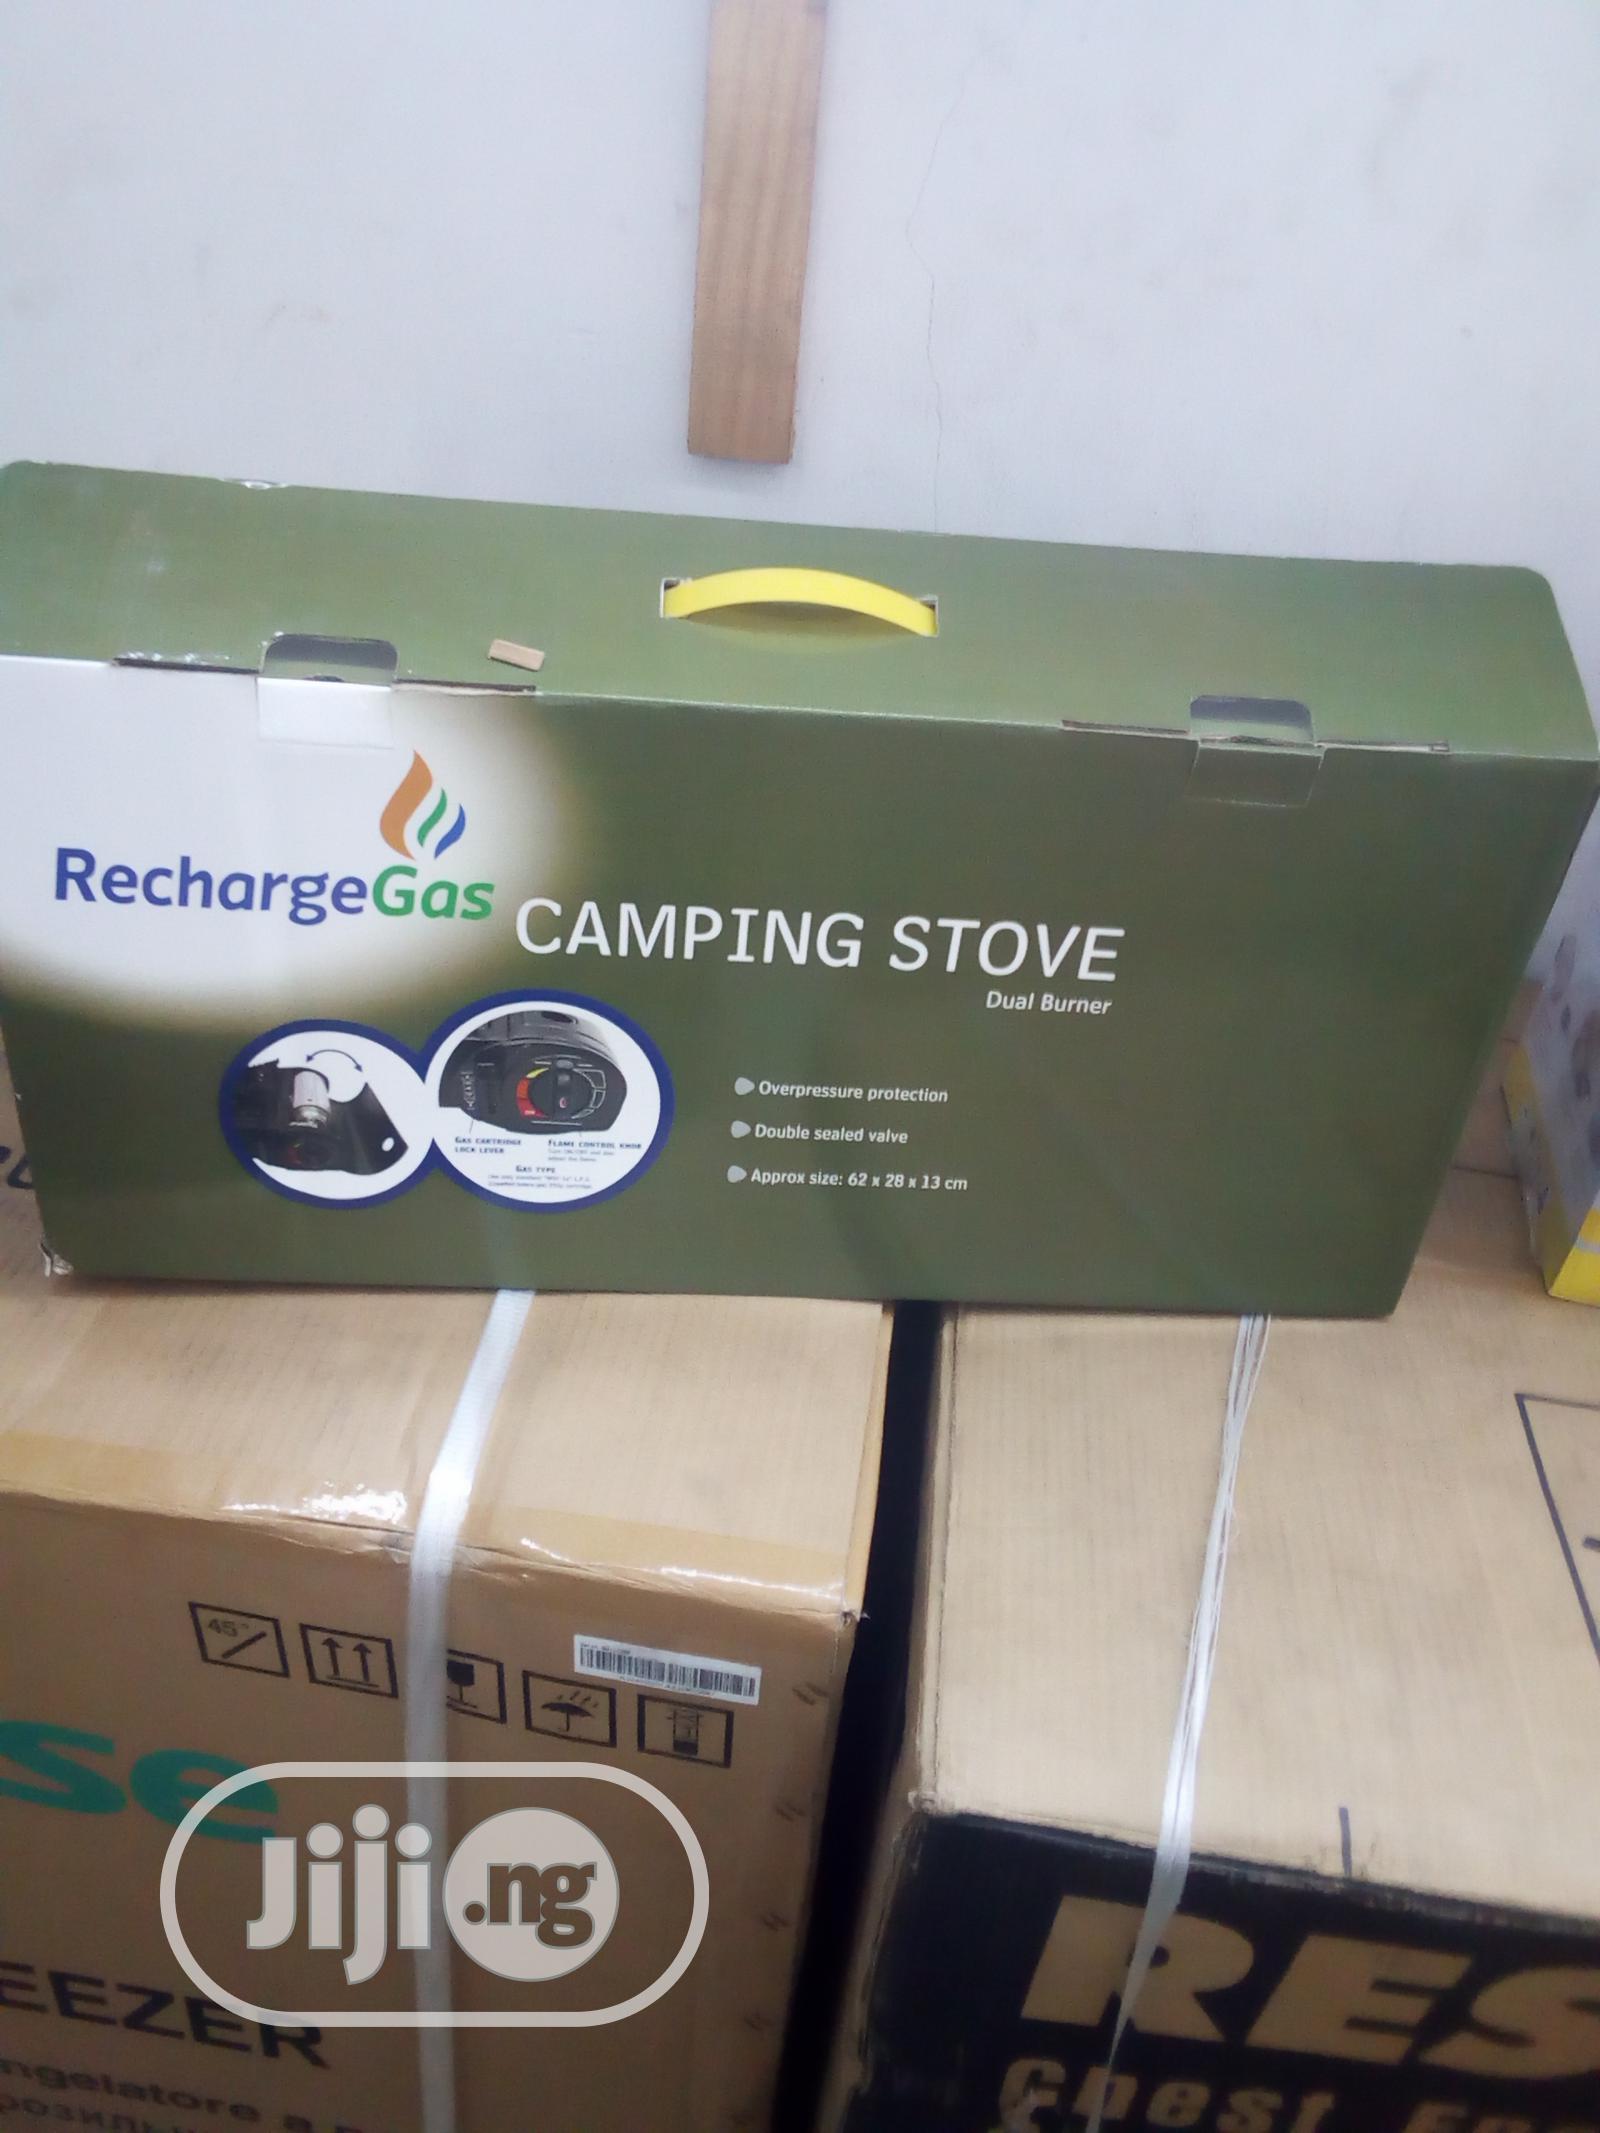 Recharge Gas Camping Stove Dual Burner